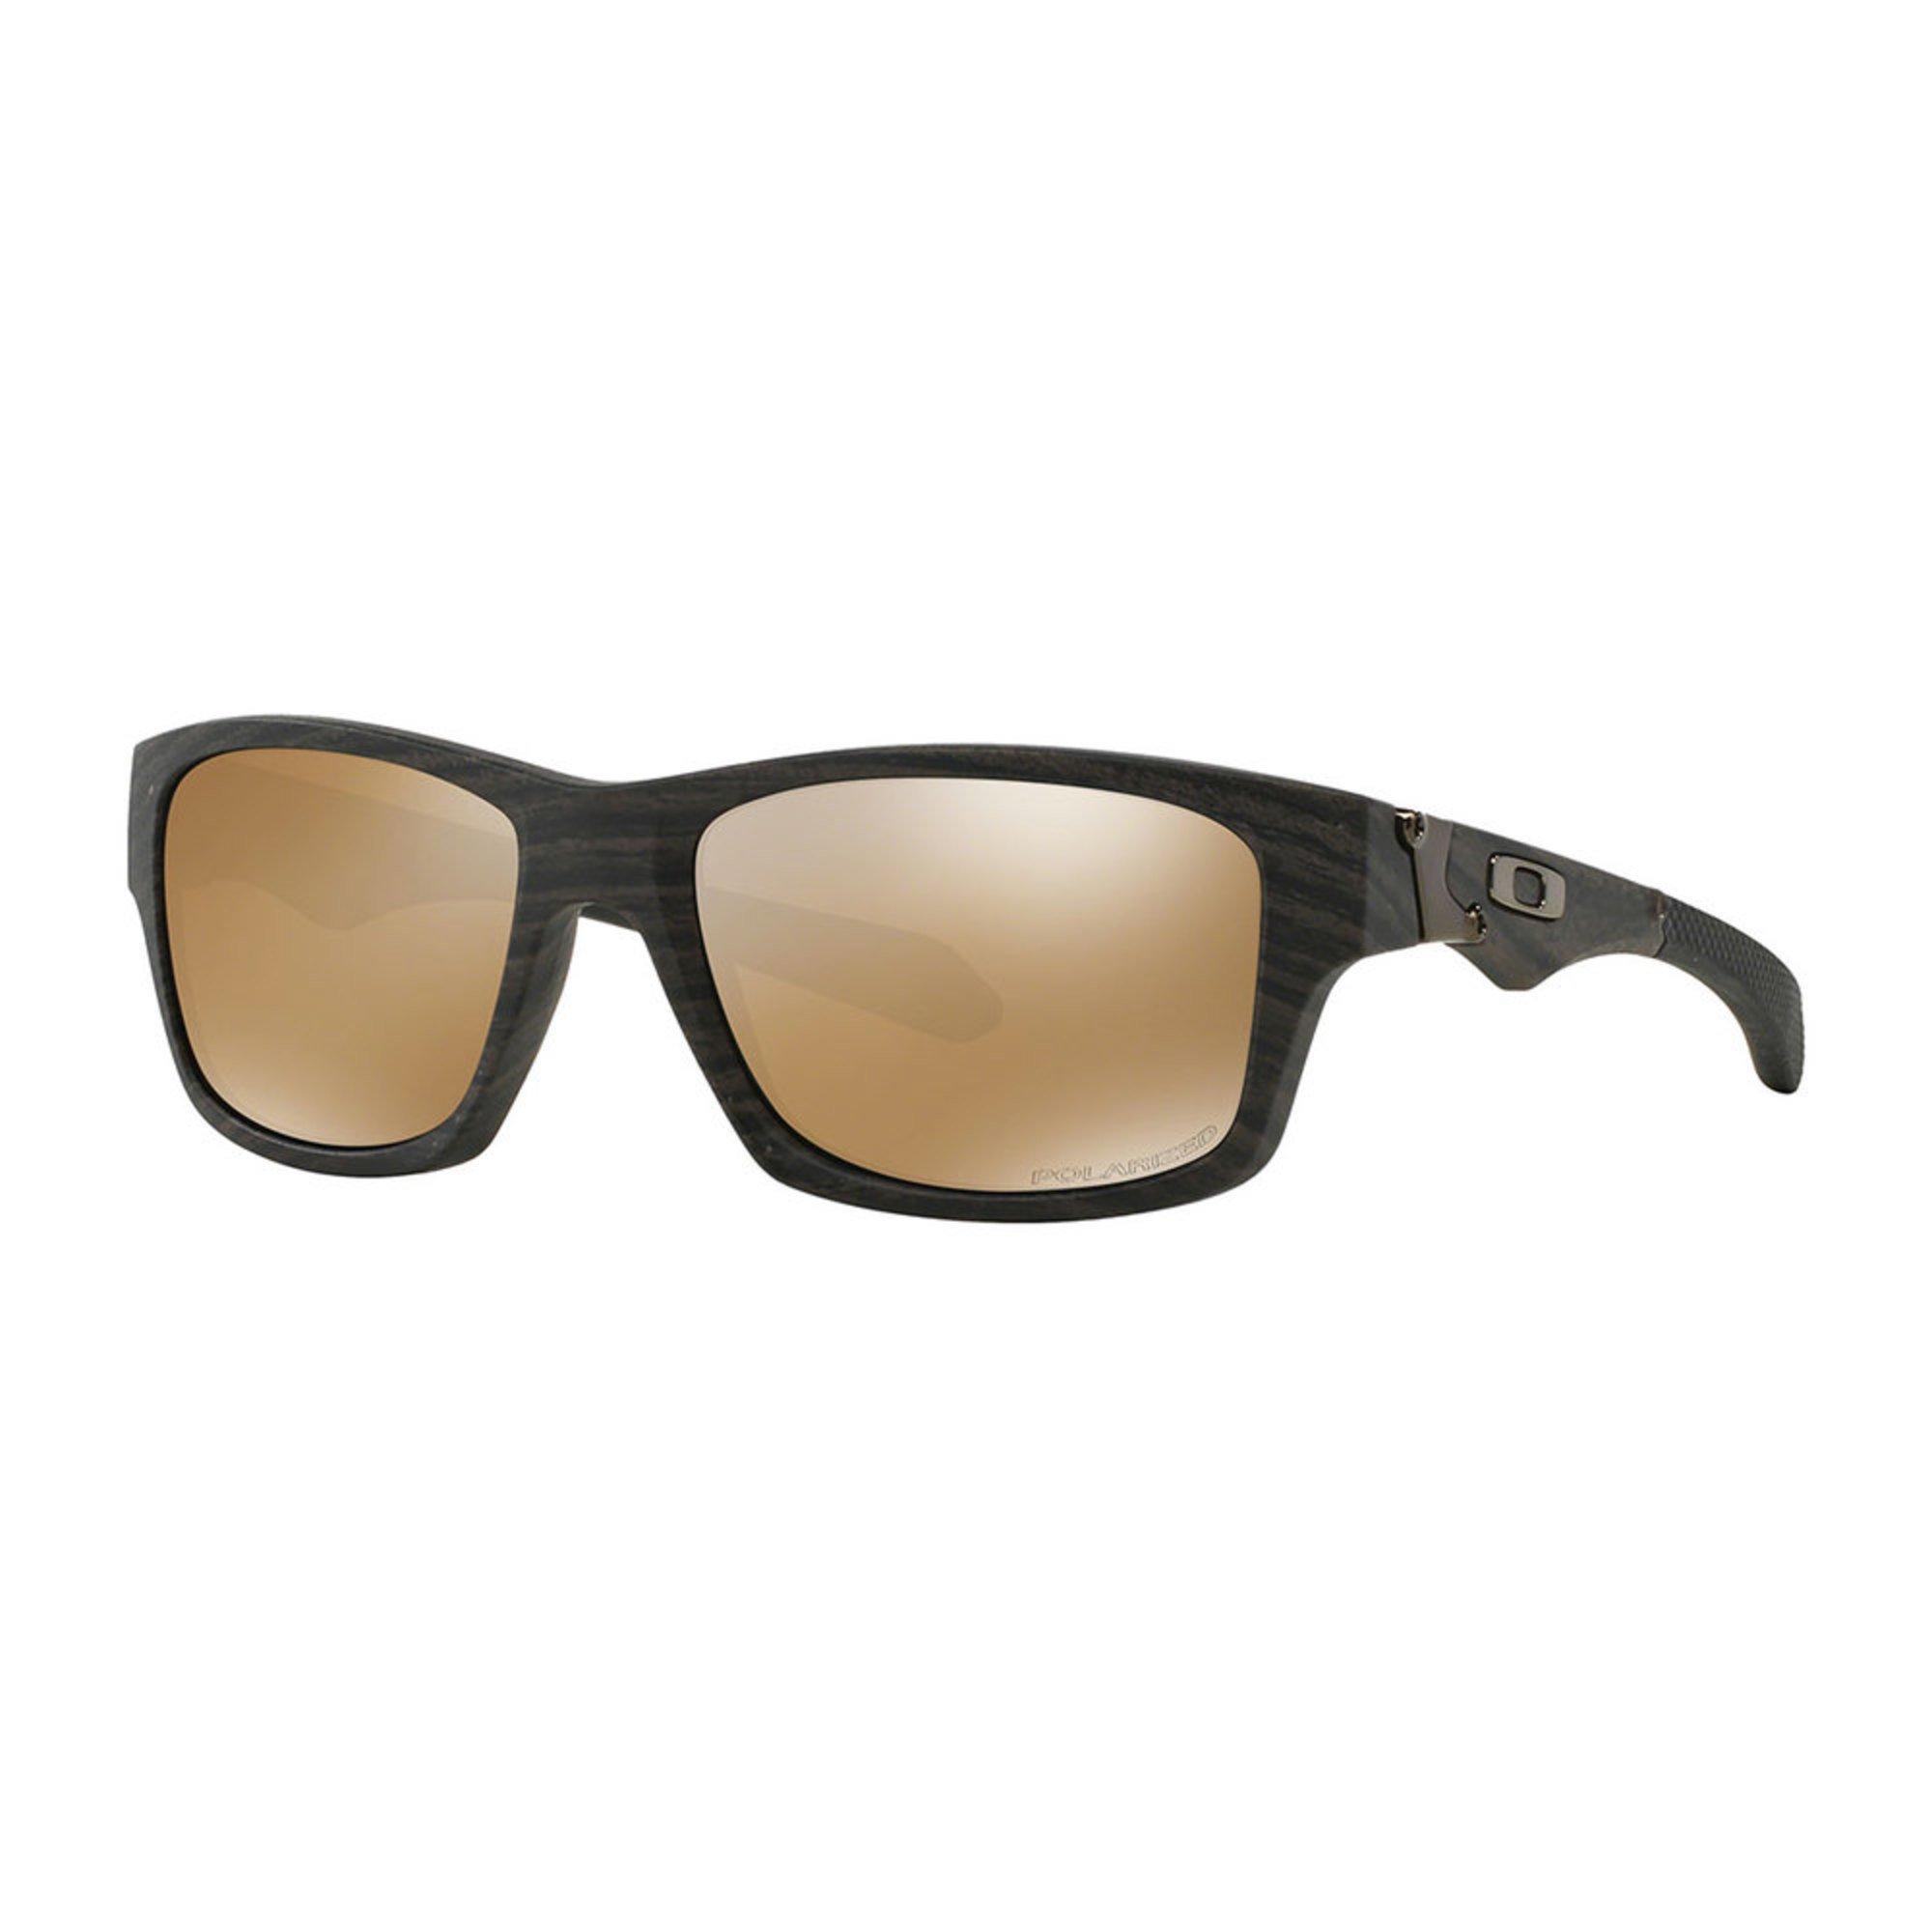 7a6cd35095f Oakley. Oakley Men s Polarized Jupiter Square Prizm Sunglasses